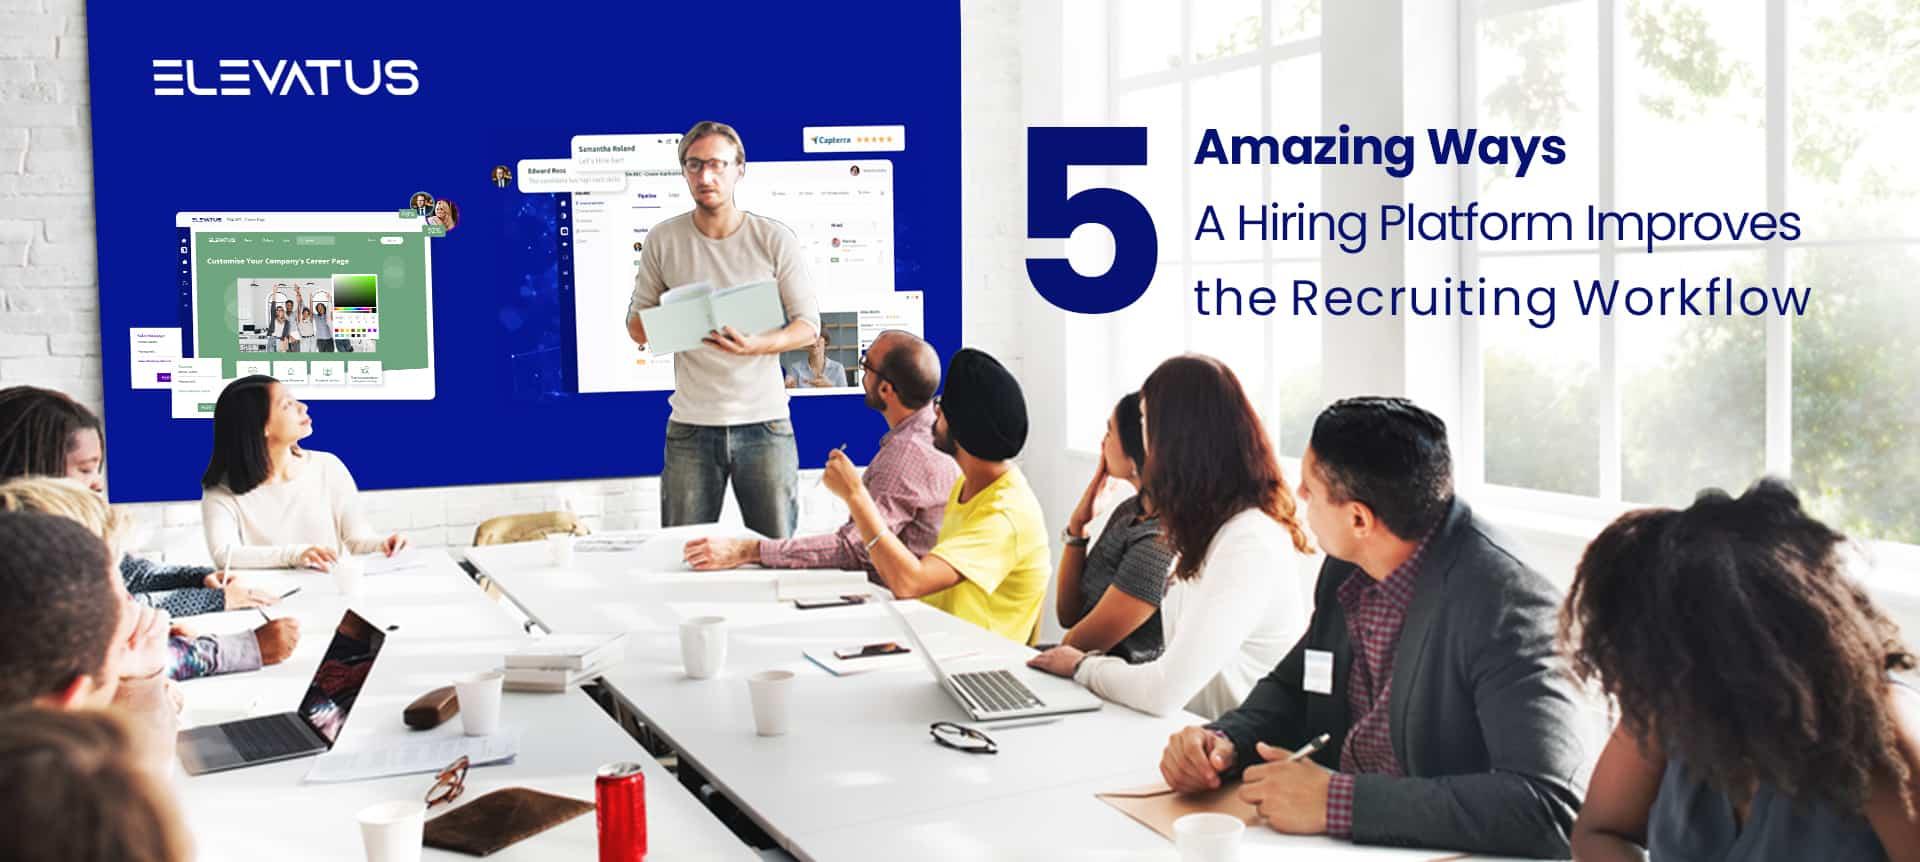 Recruiters using a hiring platform